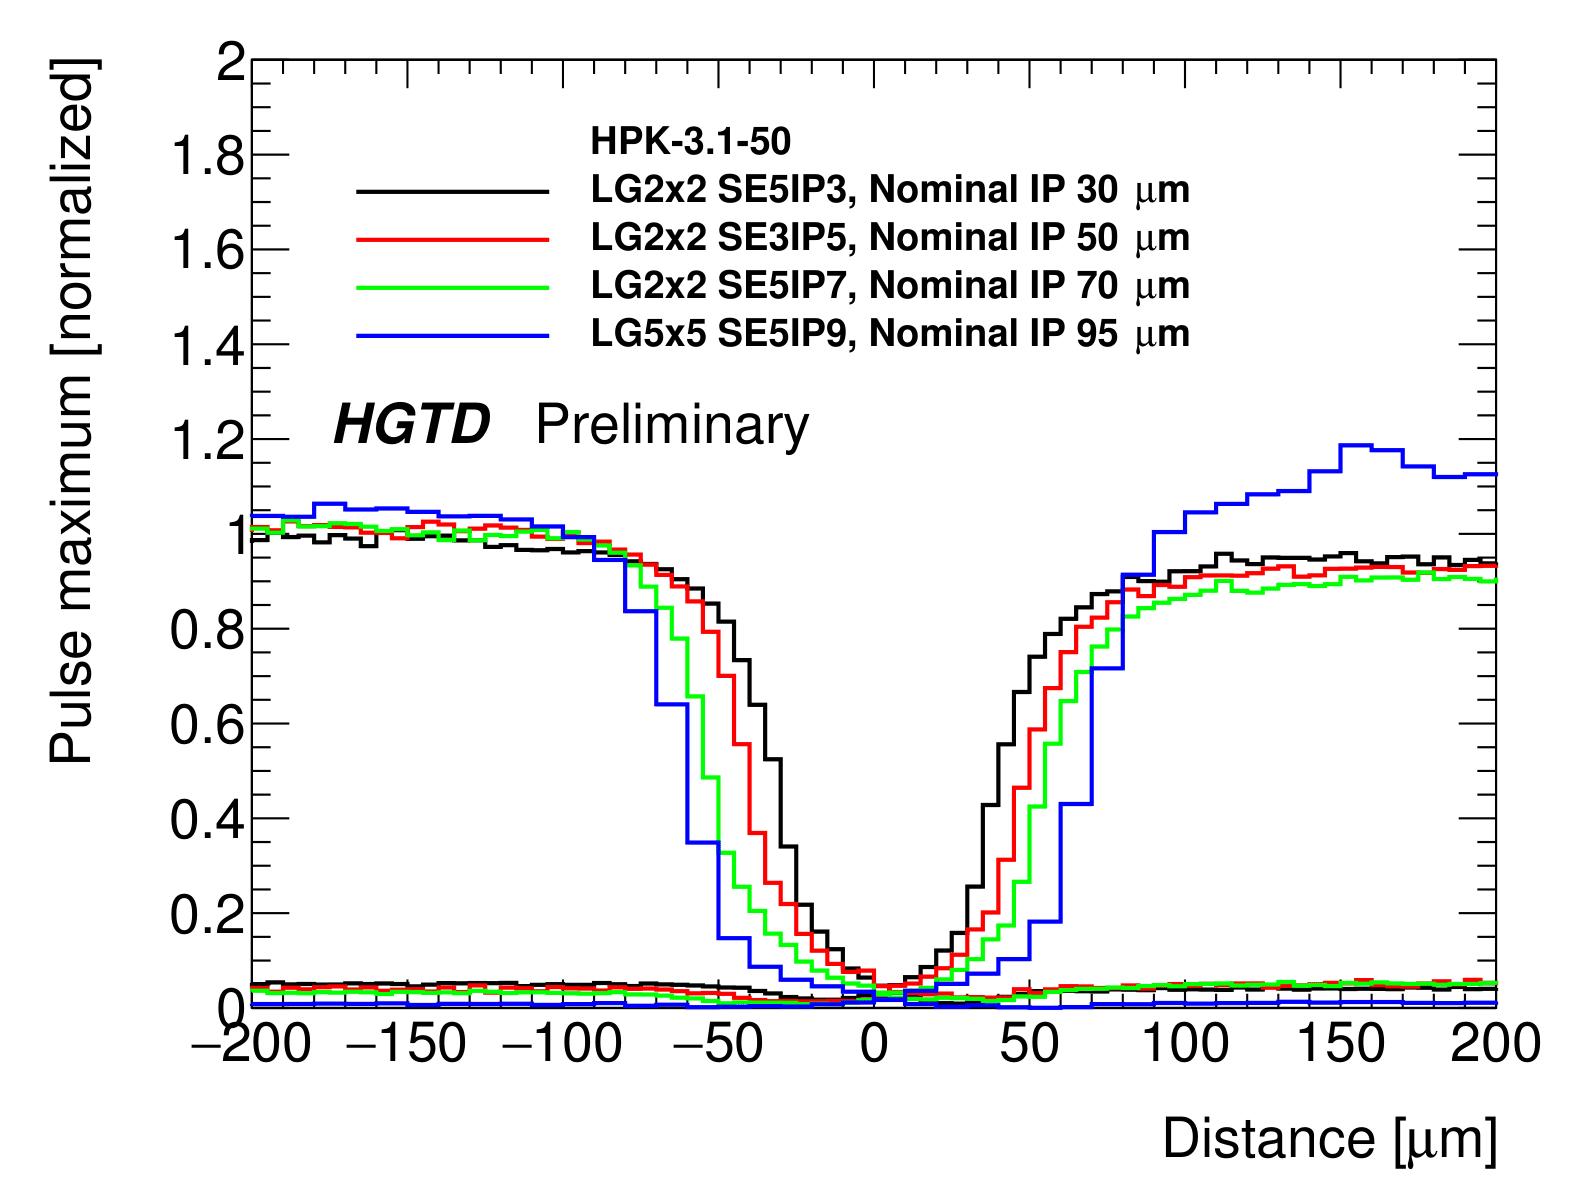 https://twiki.cern.ch/twiki/pub/AtlasPublic/HGTDPublicPlots/TCT_distances-1.png